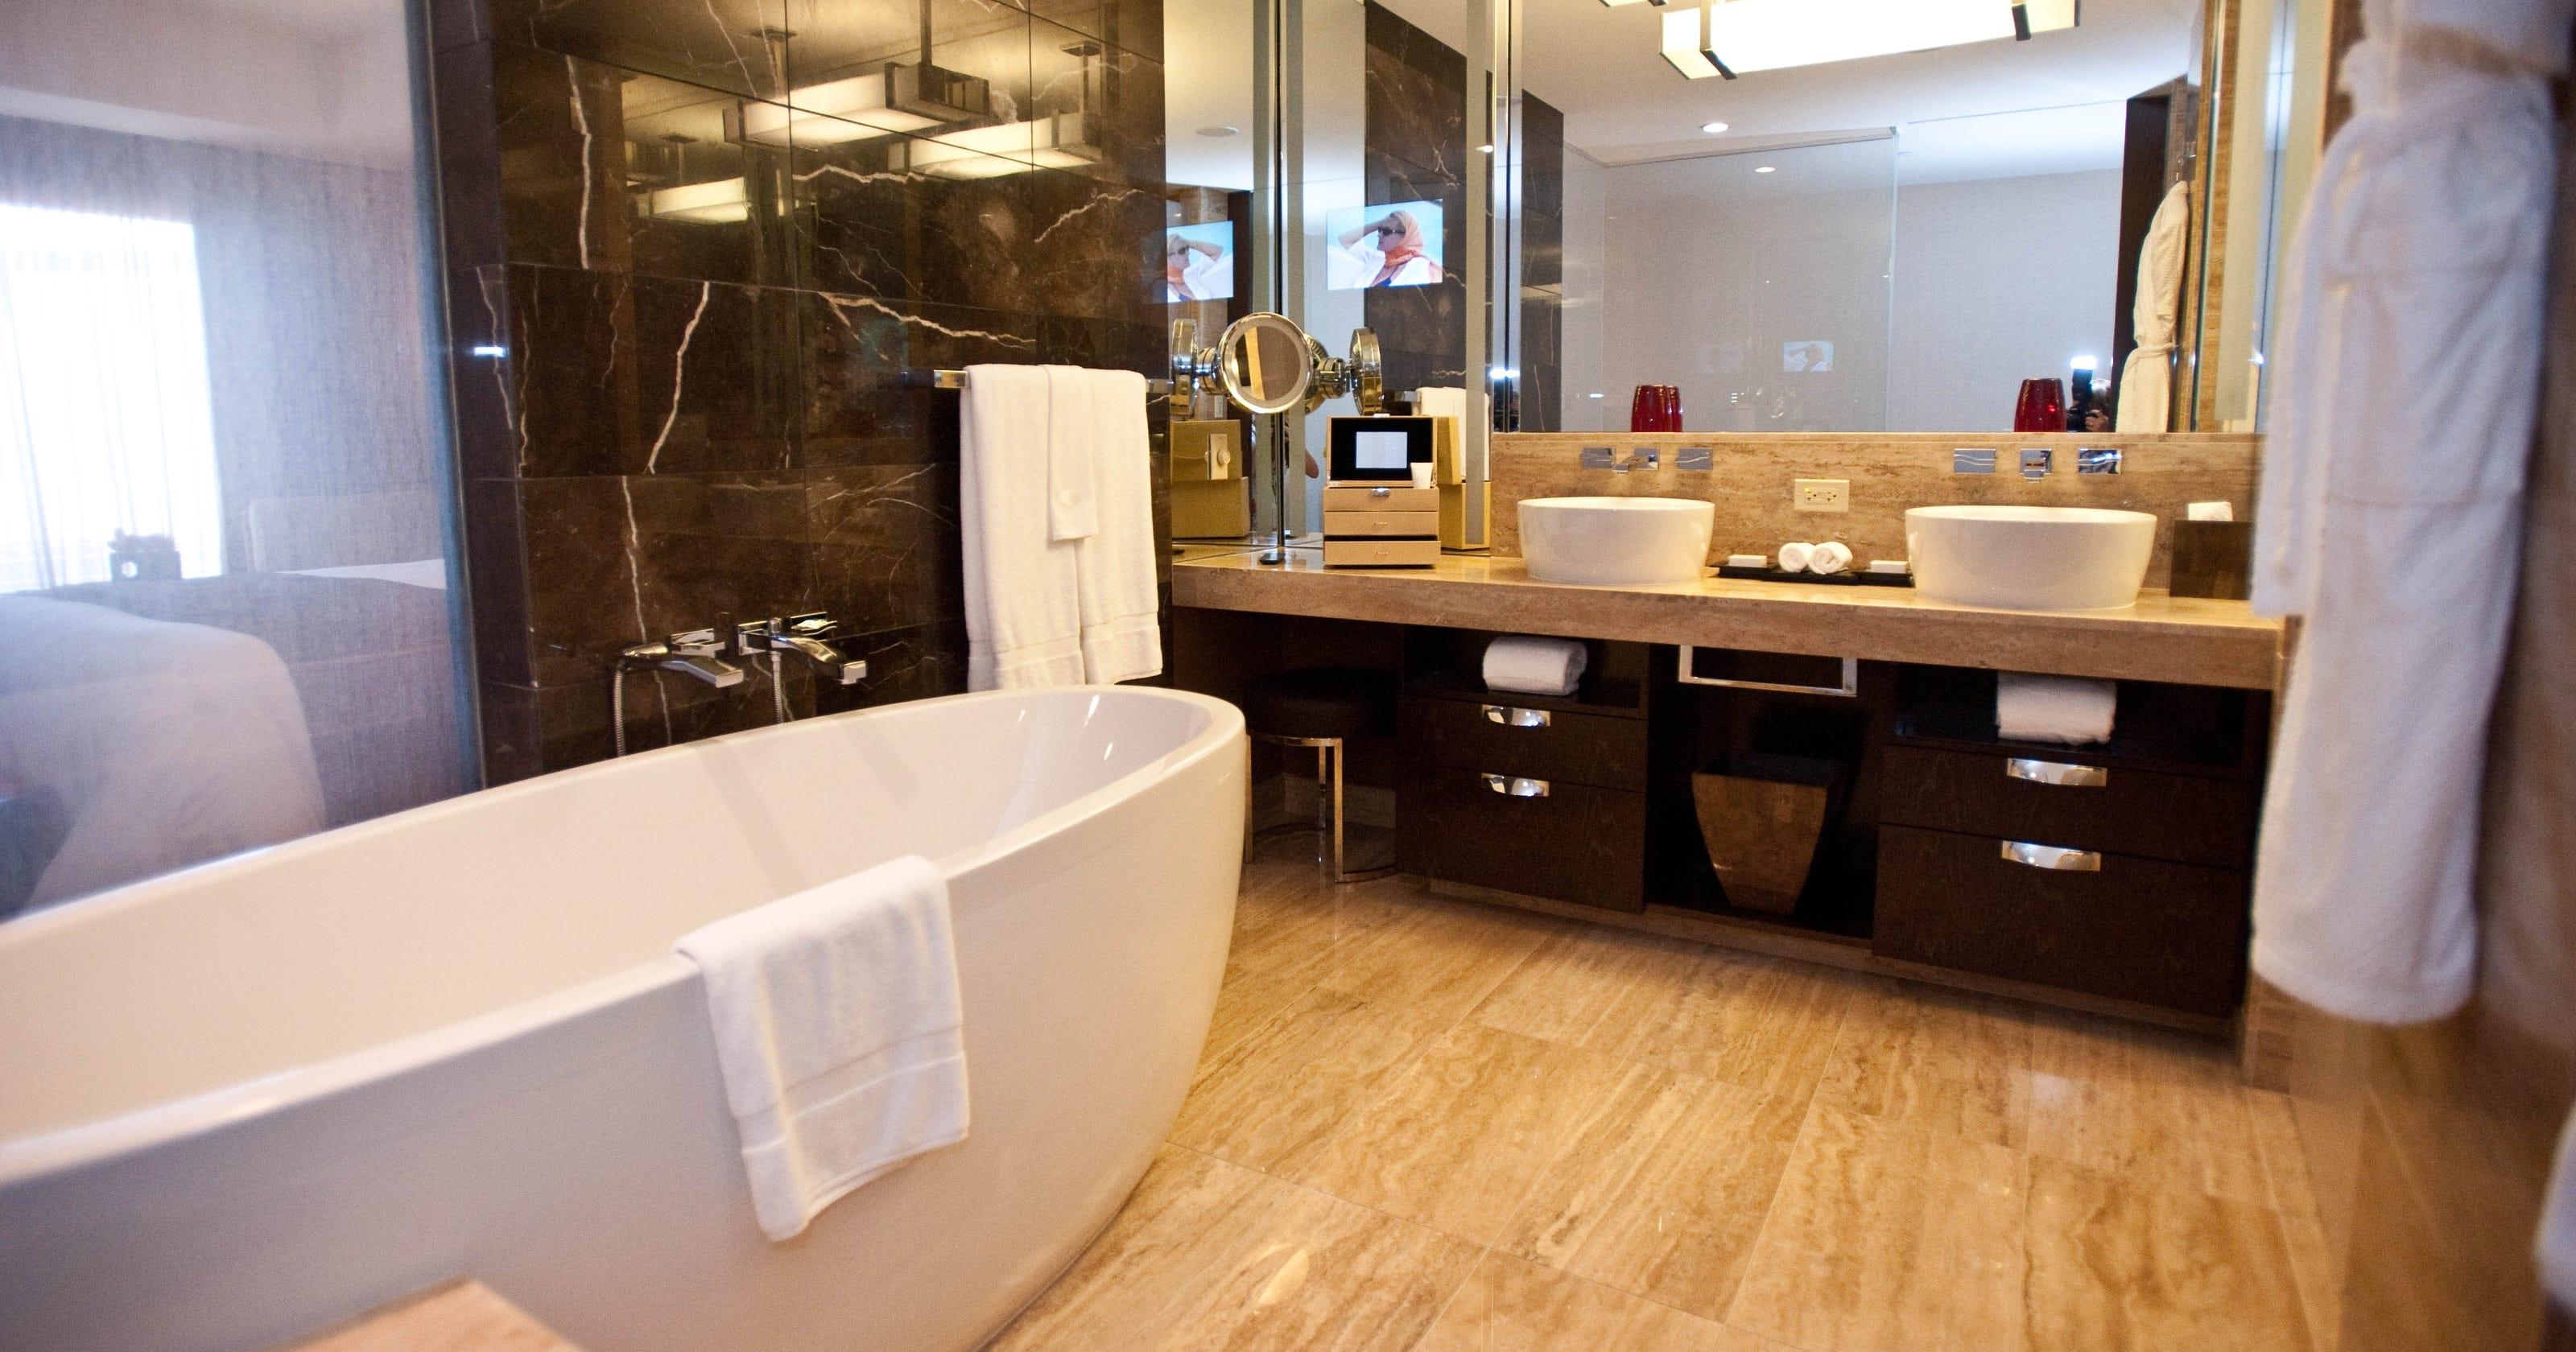 best hotel bathrooms in las vegas. Black Bedroom Furniture Sets. Home Design Ideas